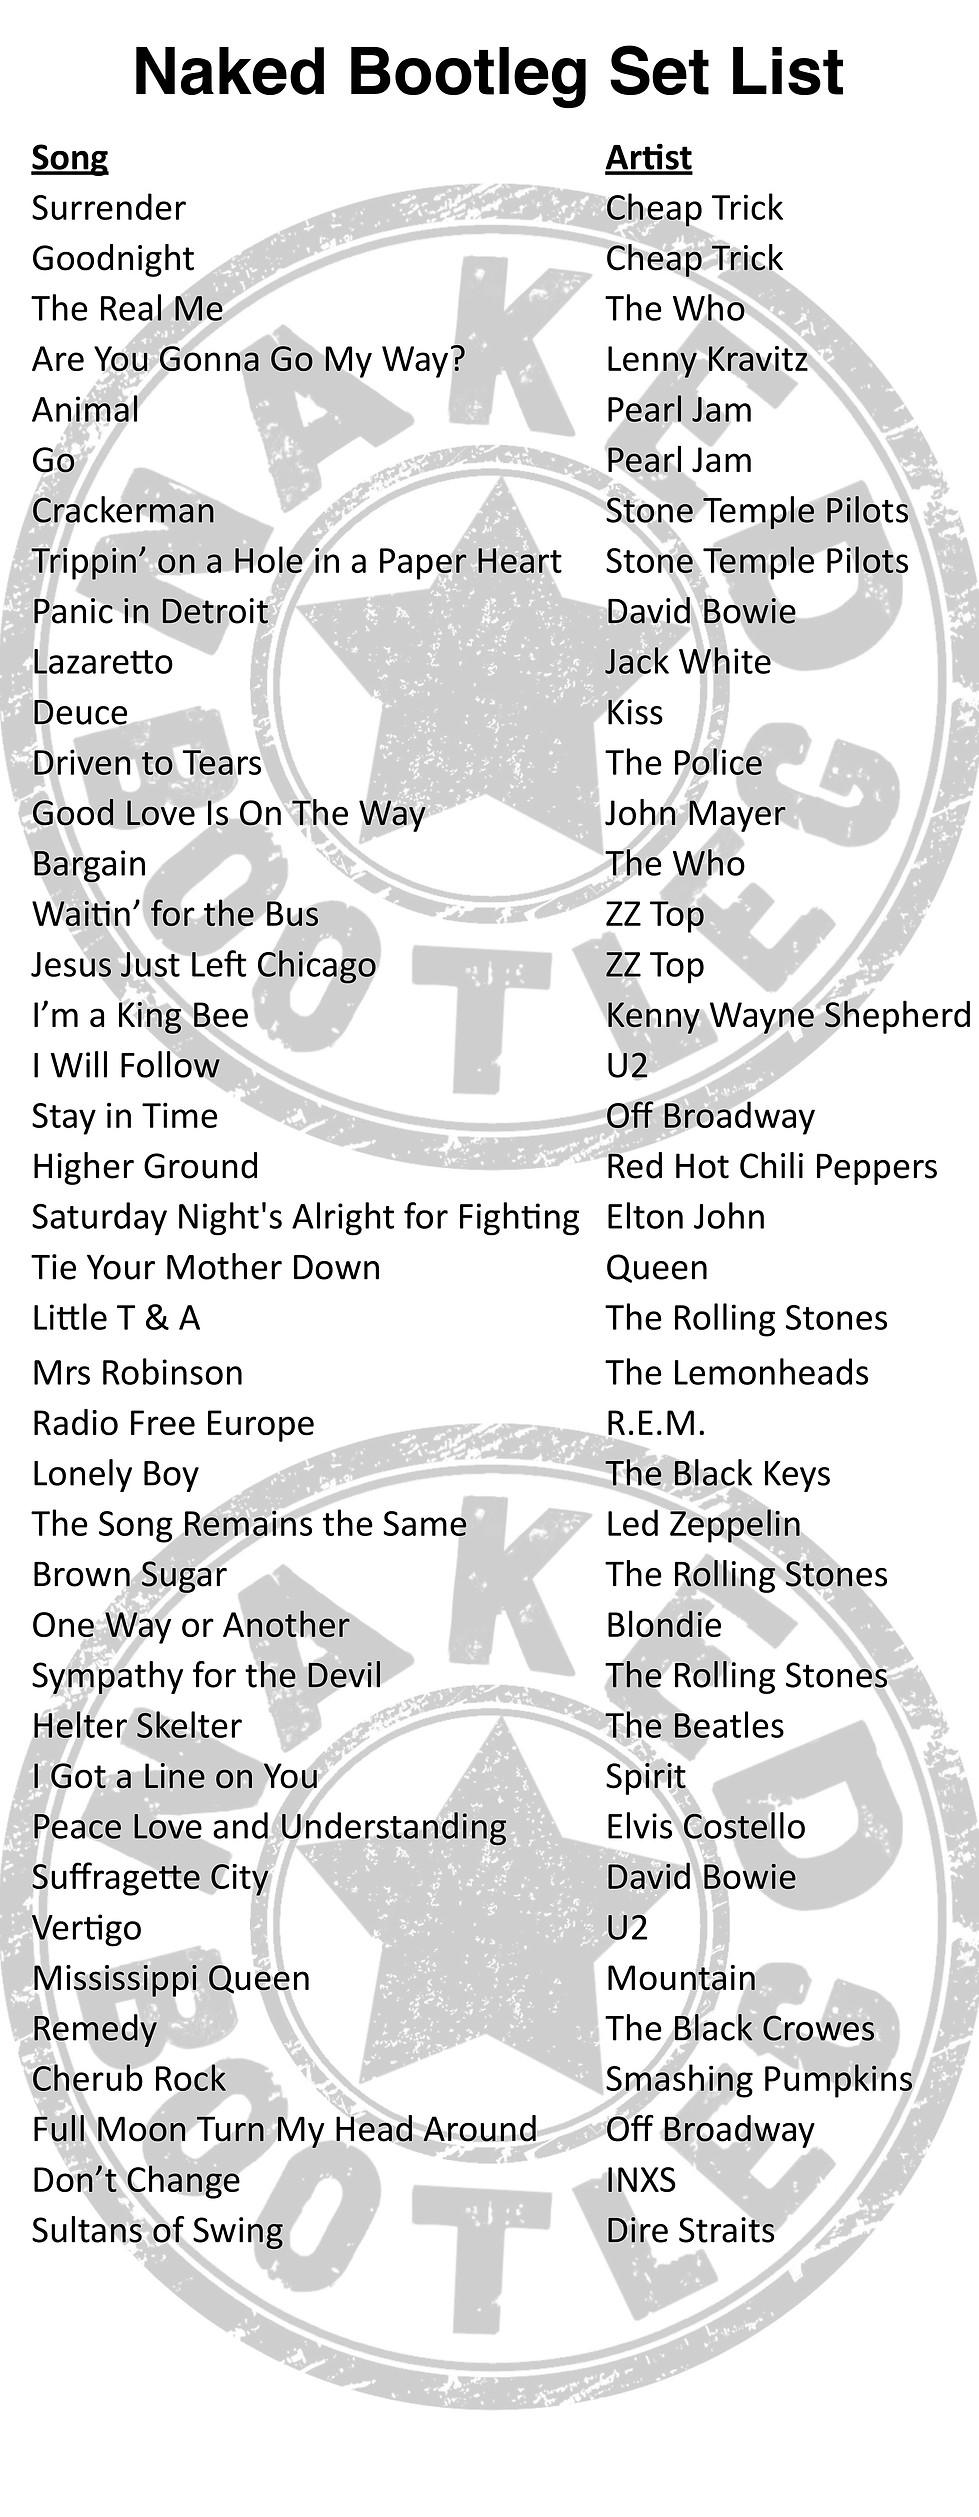 New Set List 09-08-18.jpg